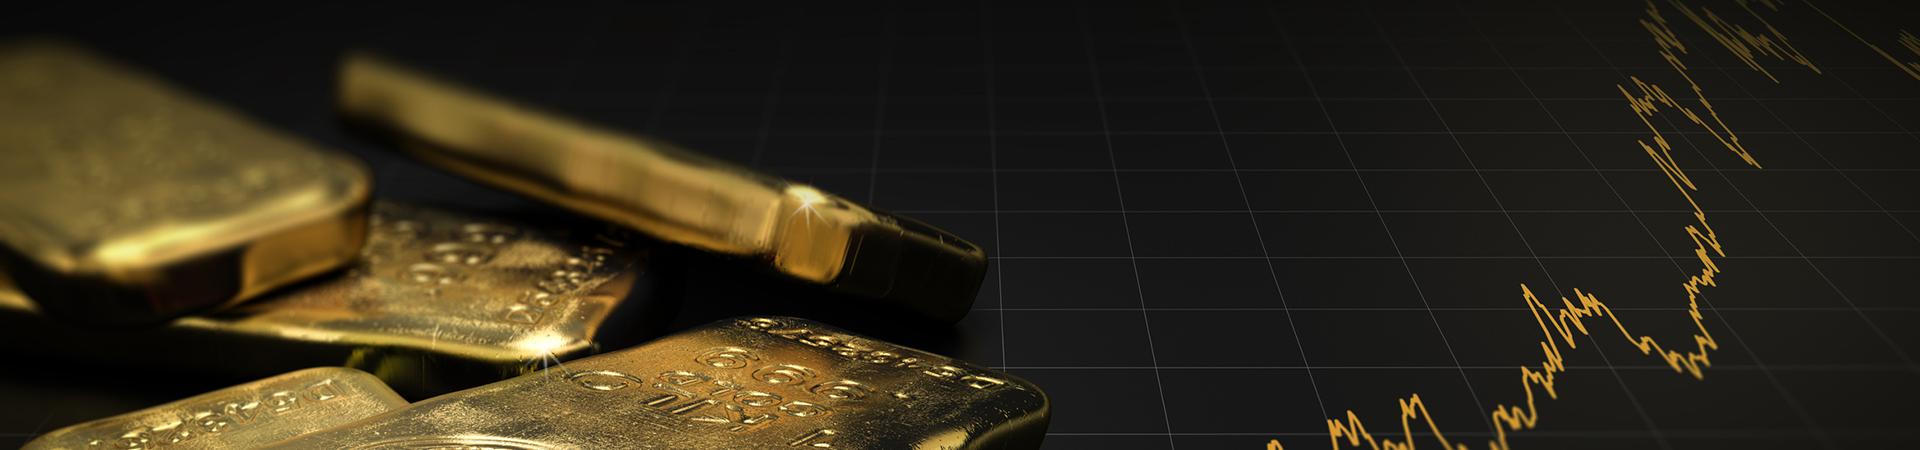 Unallocated gold accounts